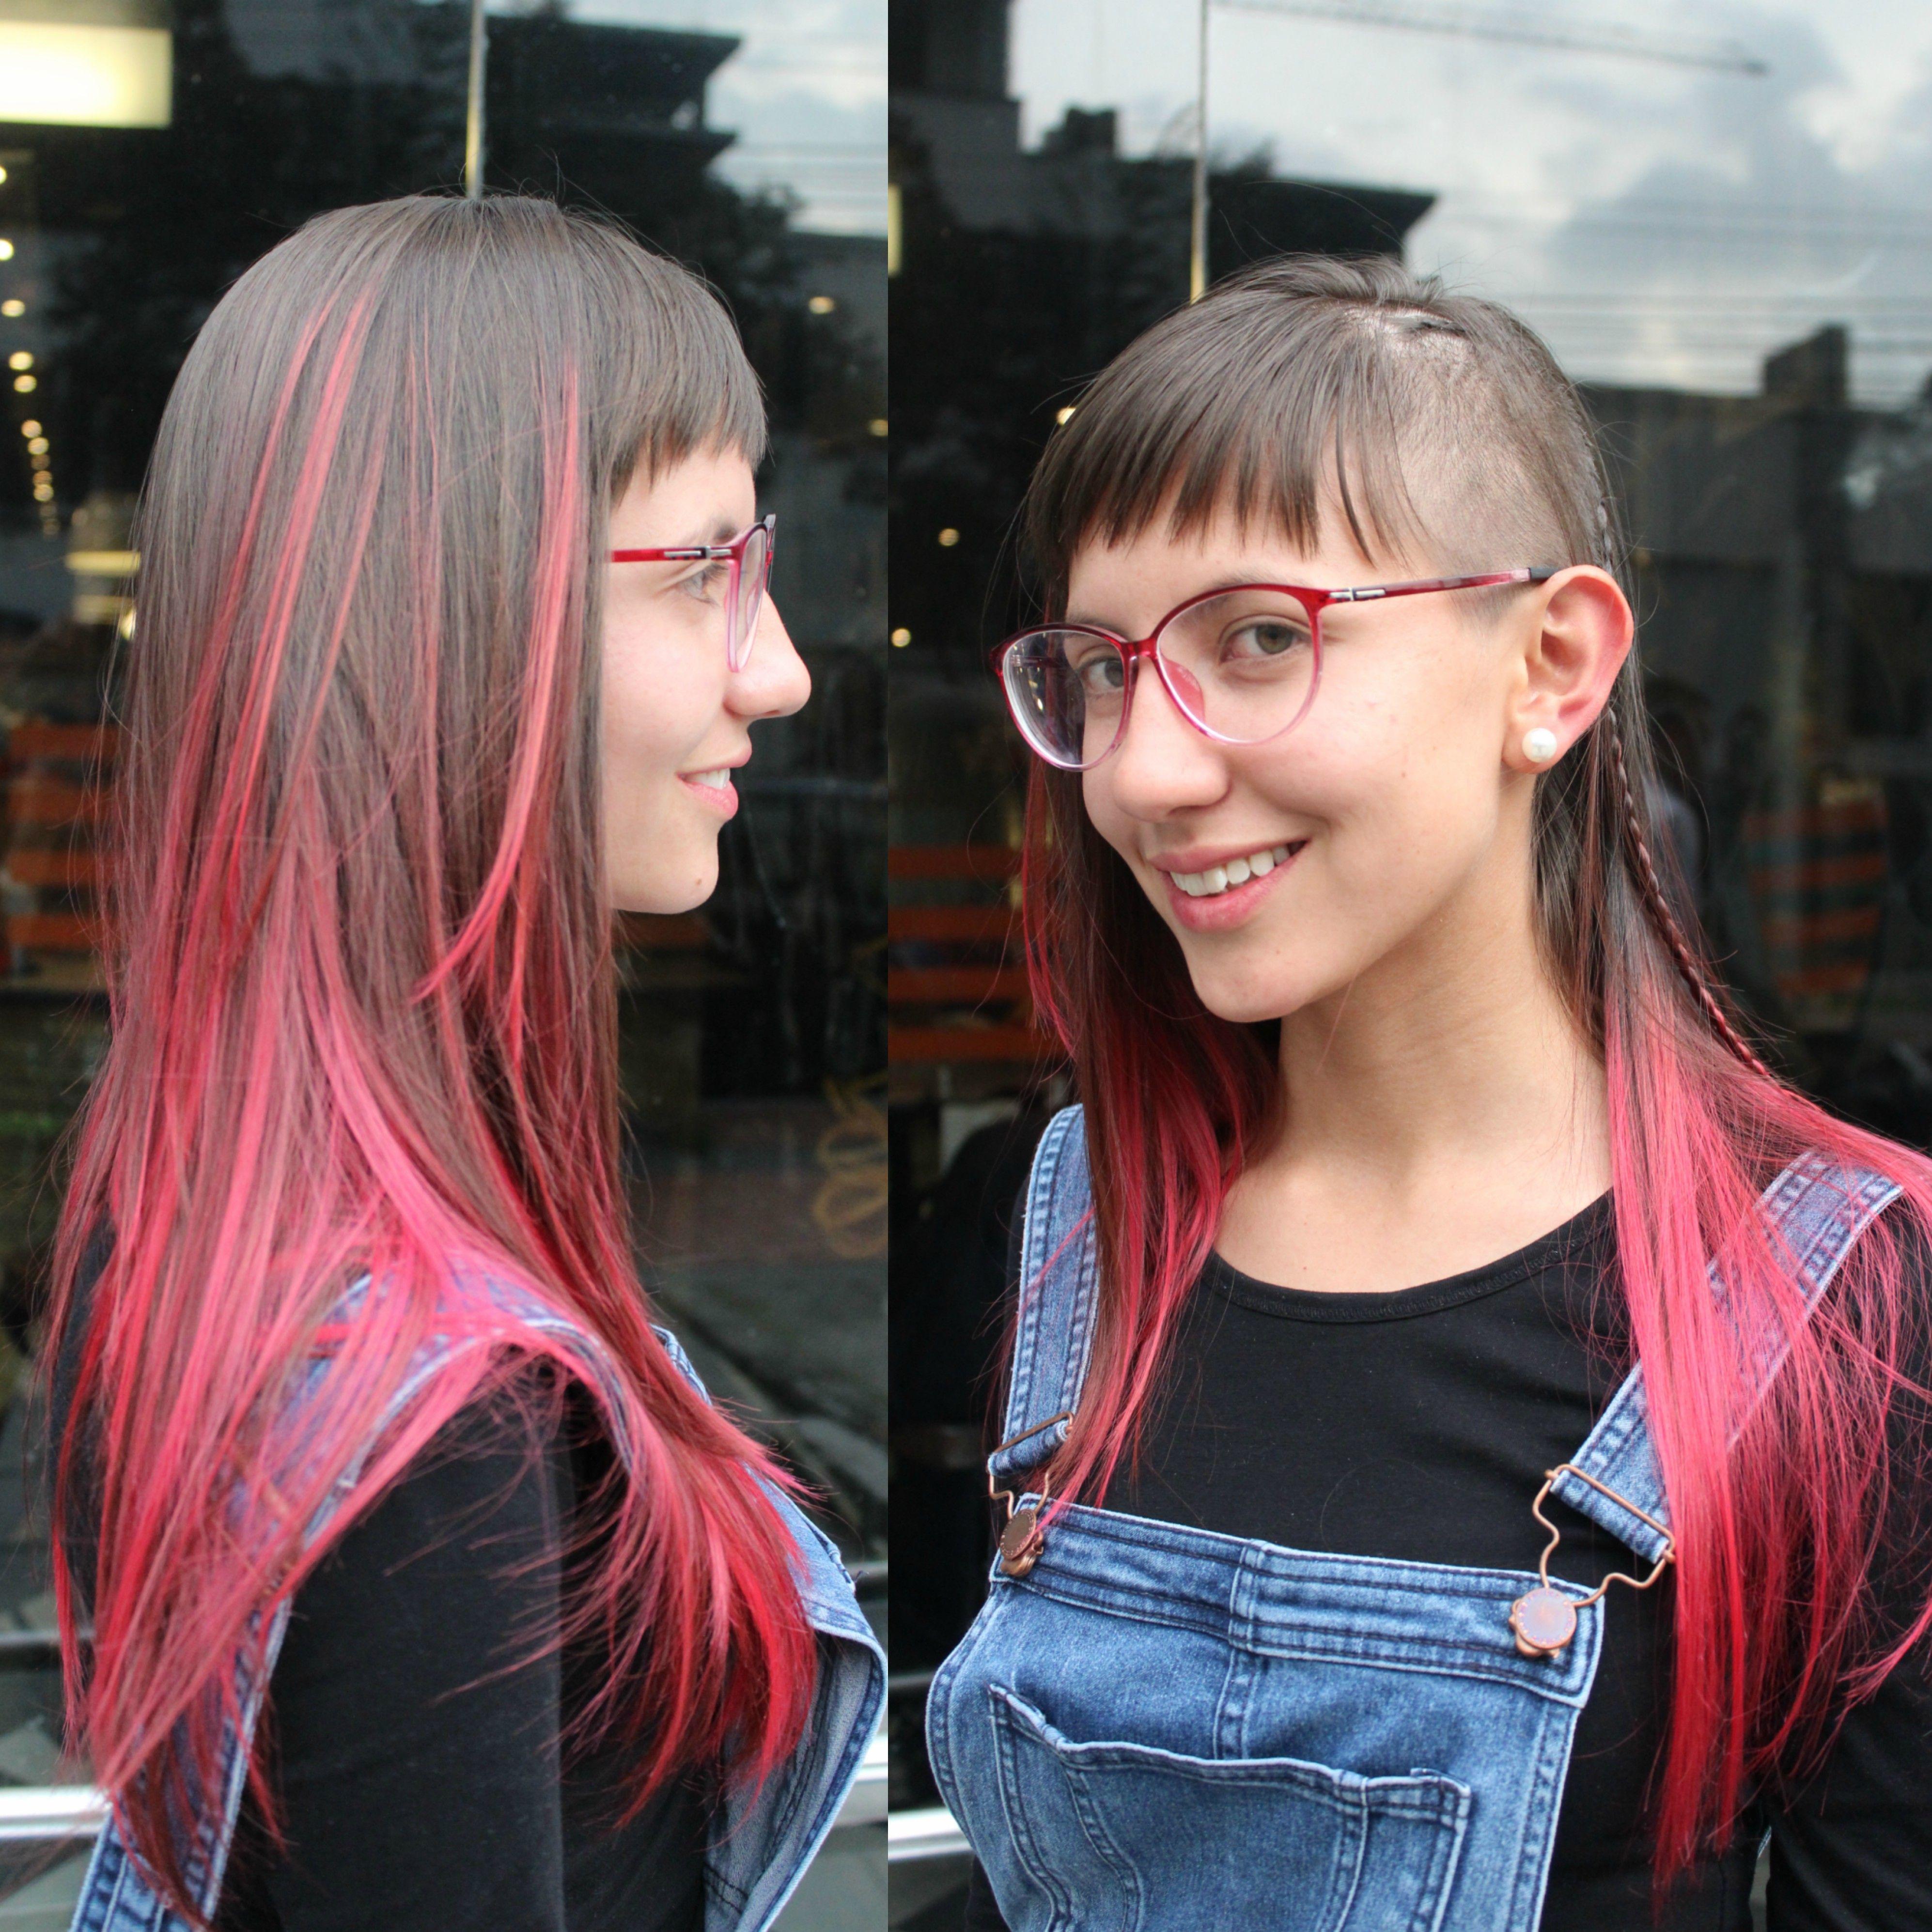 Look irreverente - mechitas rojas sin uniformidad. Artista: David Divano